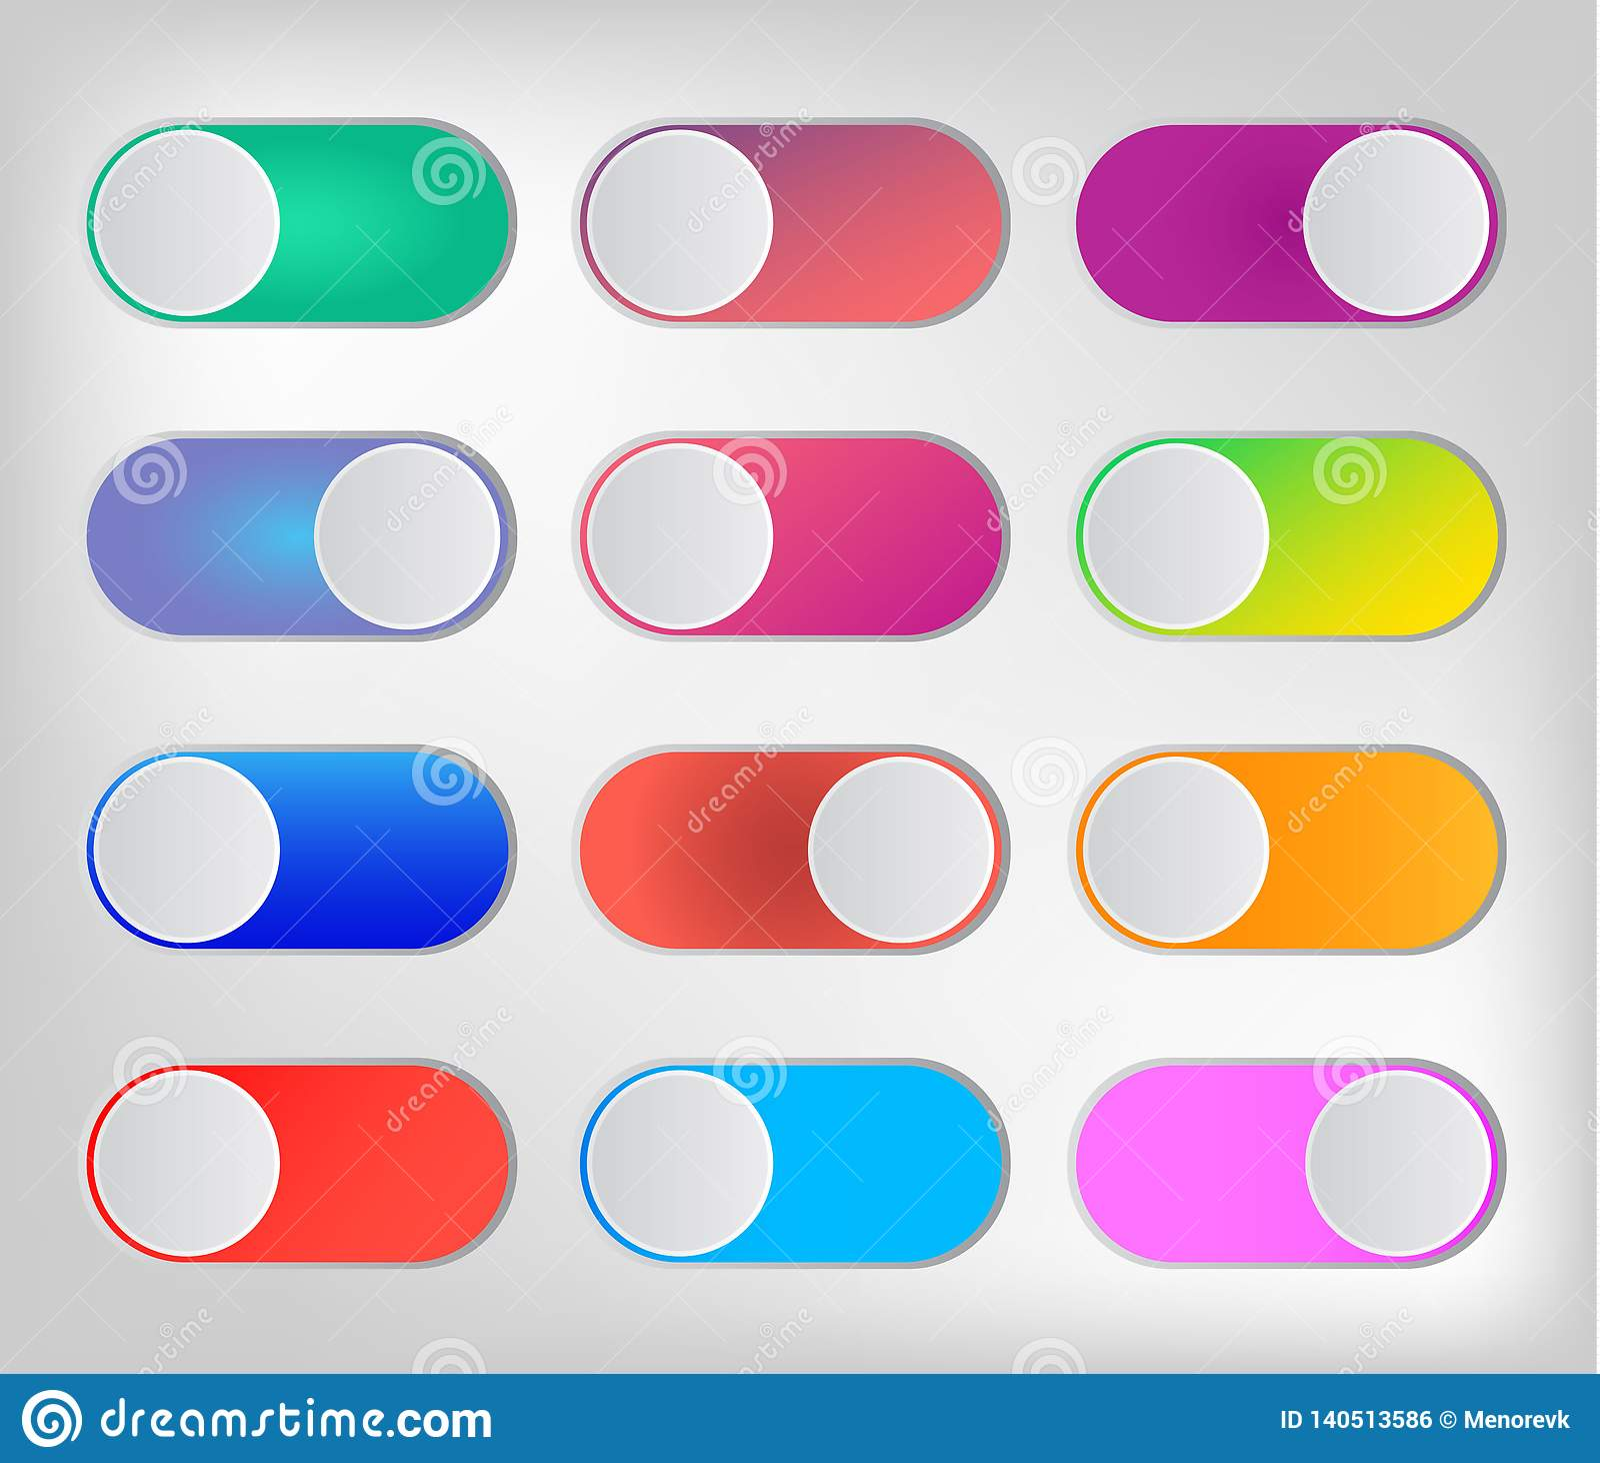 Onoff colorido dos agulheiros do ícone liso isolado no fundo branco